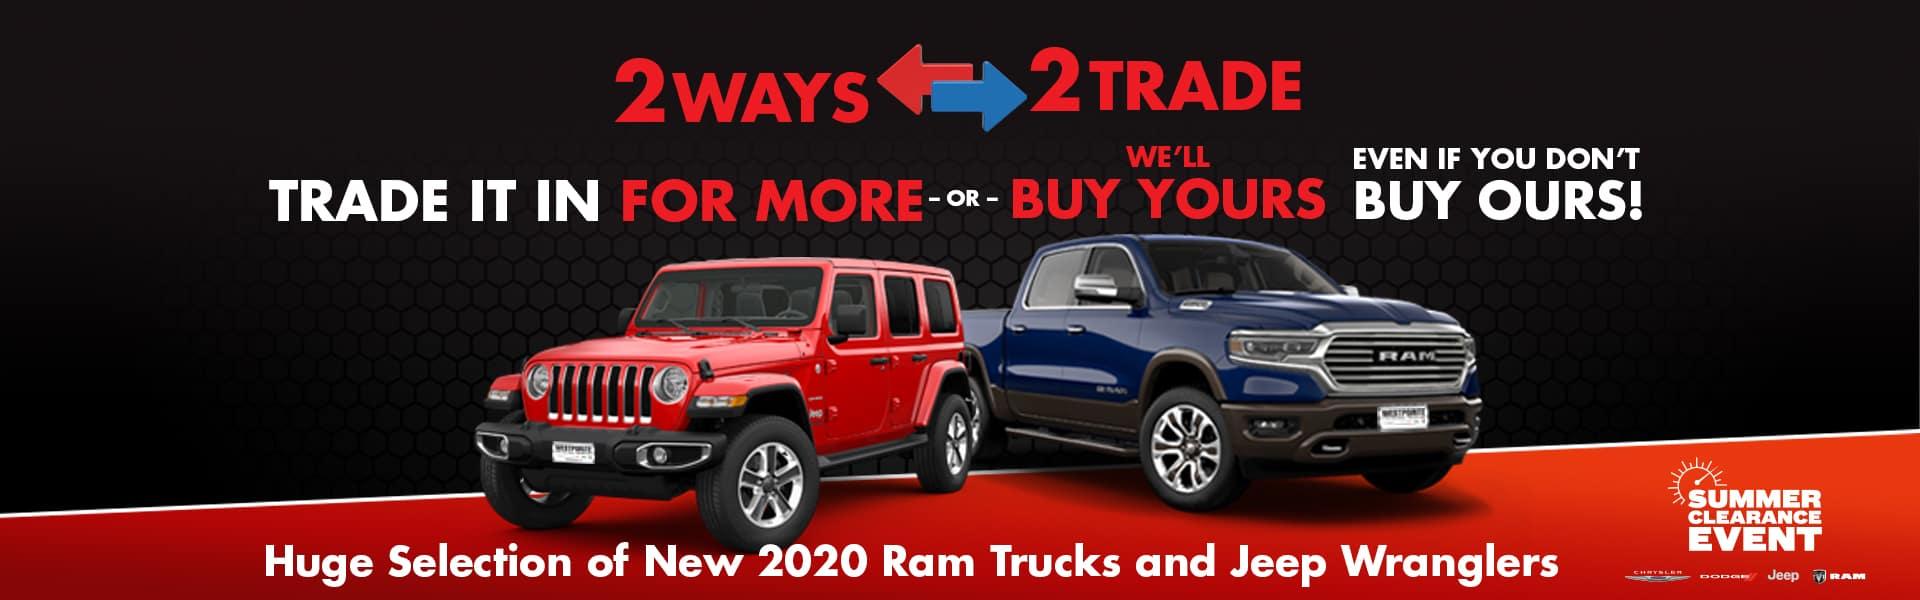 2 Ways 2 Trade Summer Sales Event